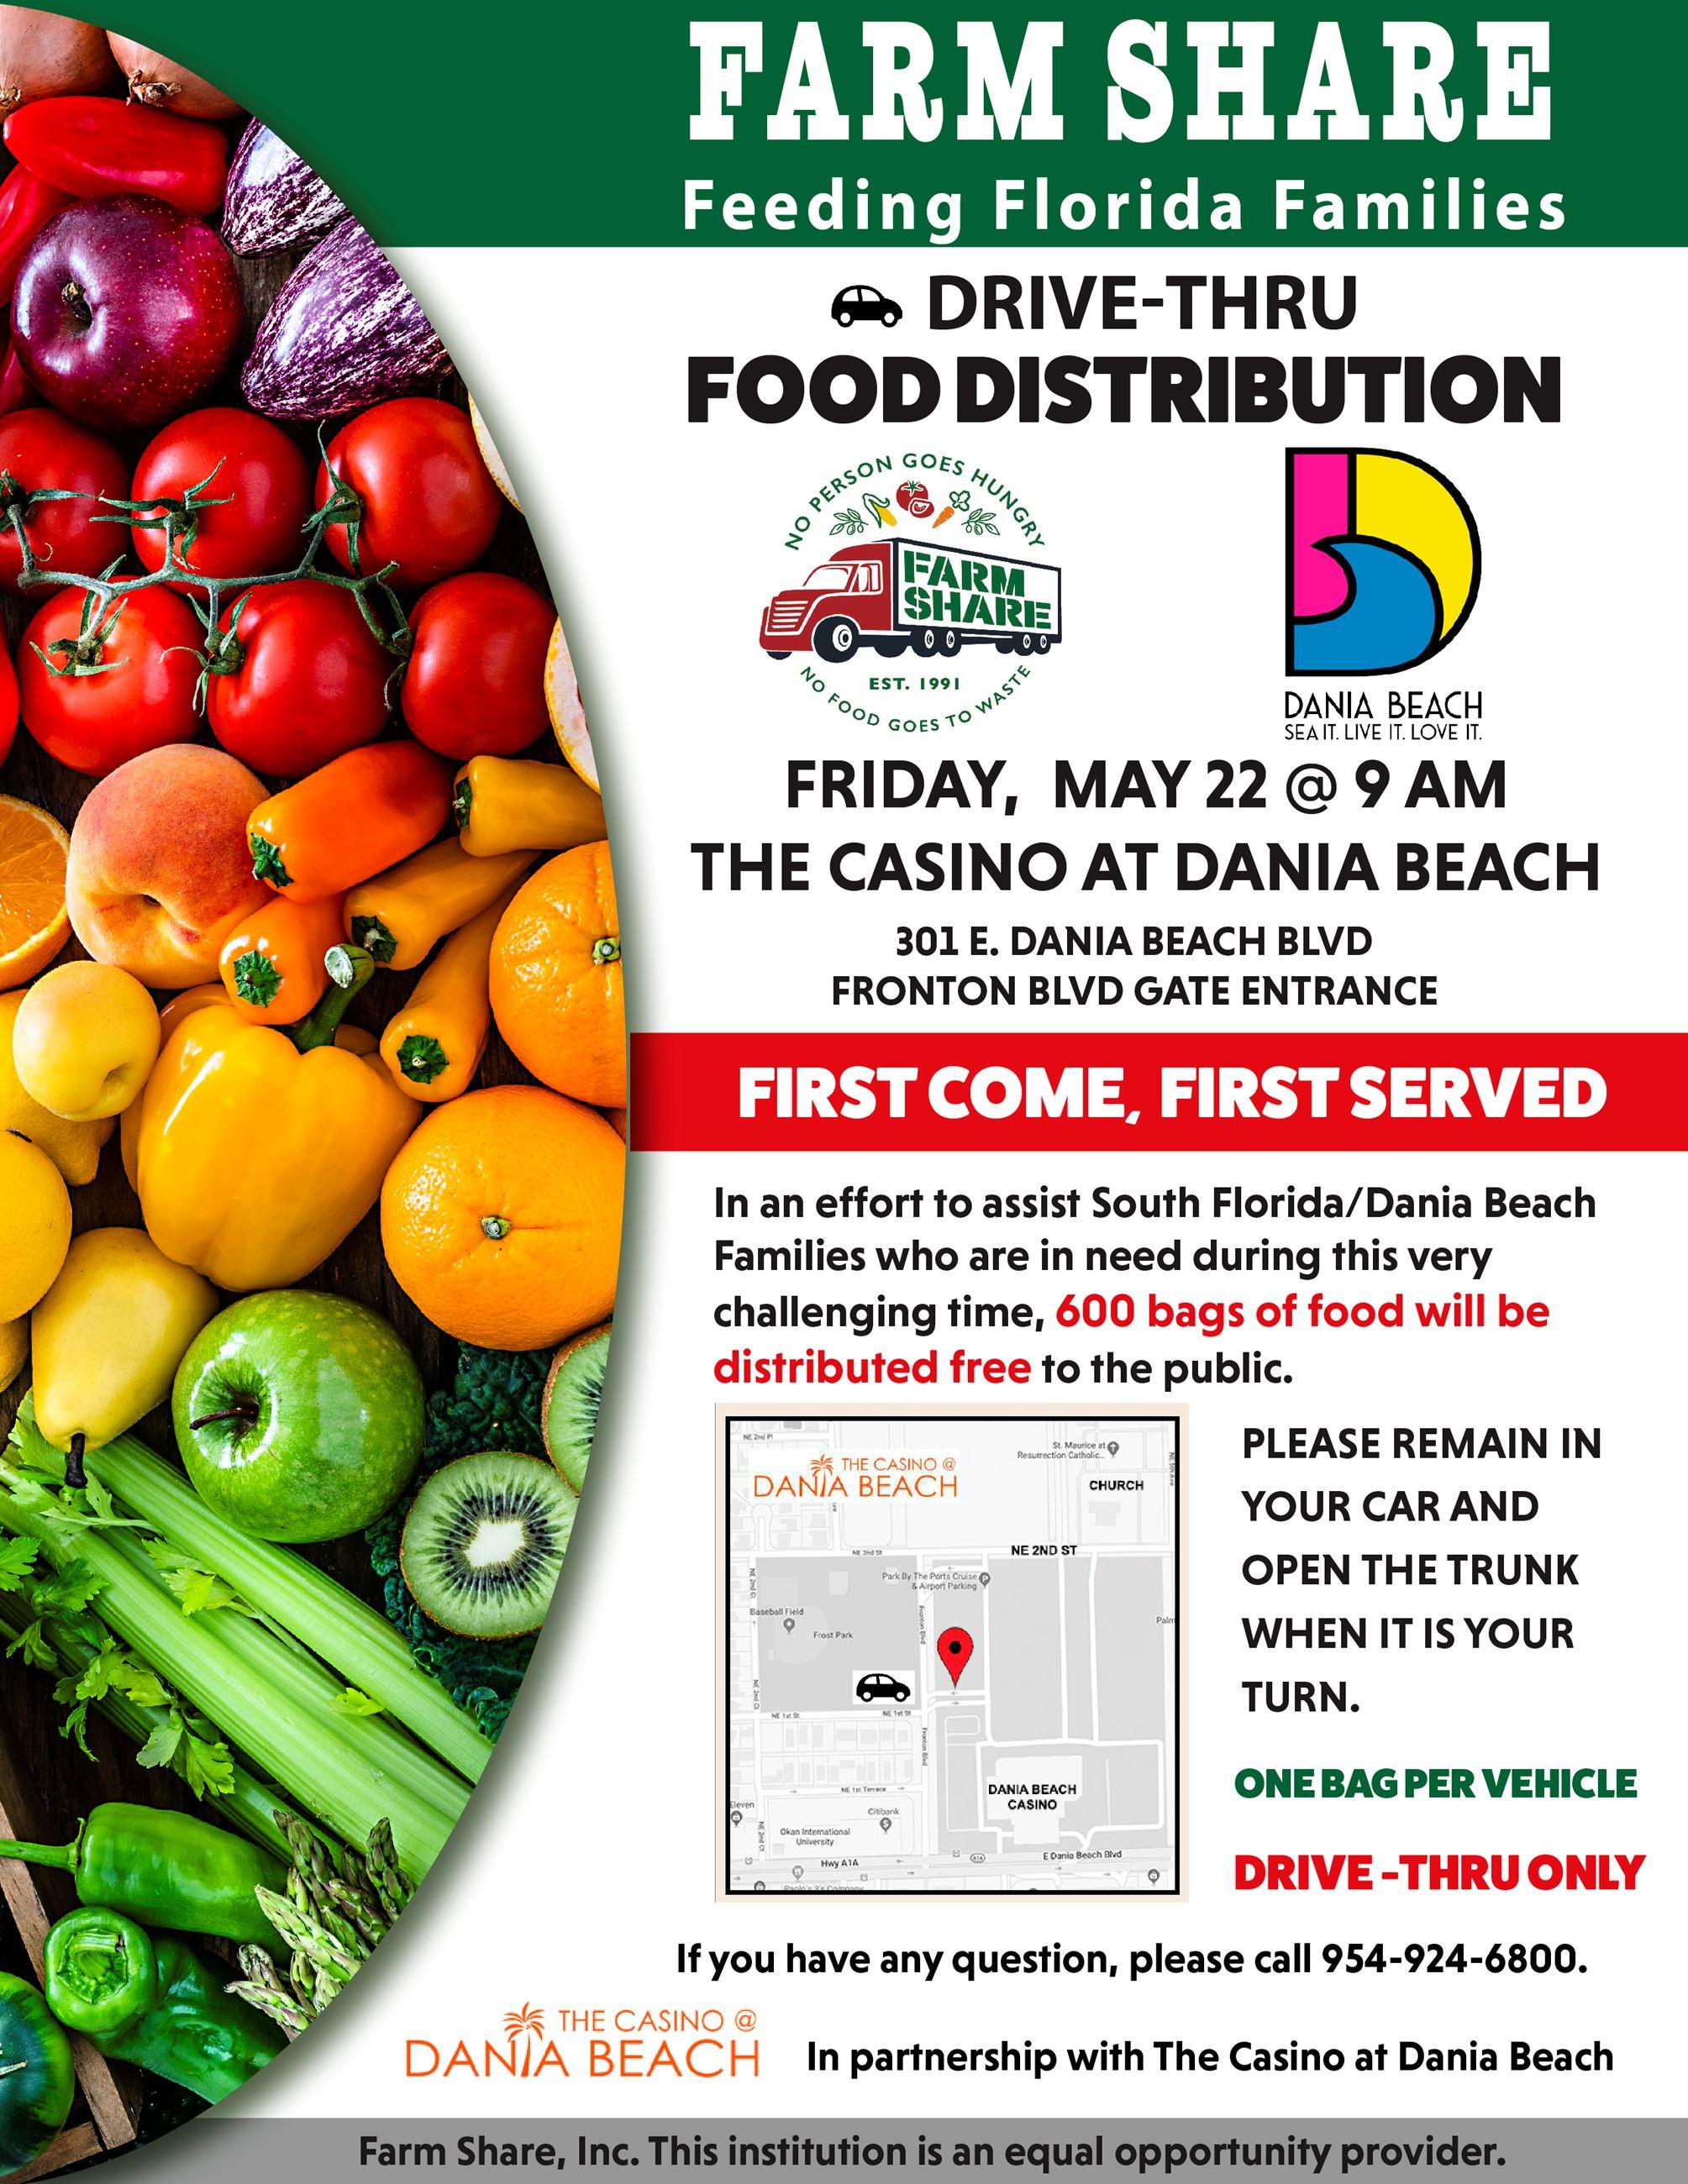 Farm Share Dania Beach Food Distribution